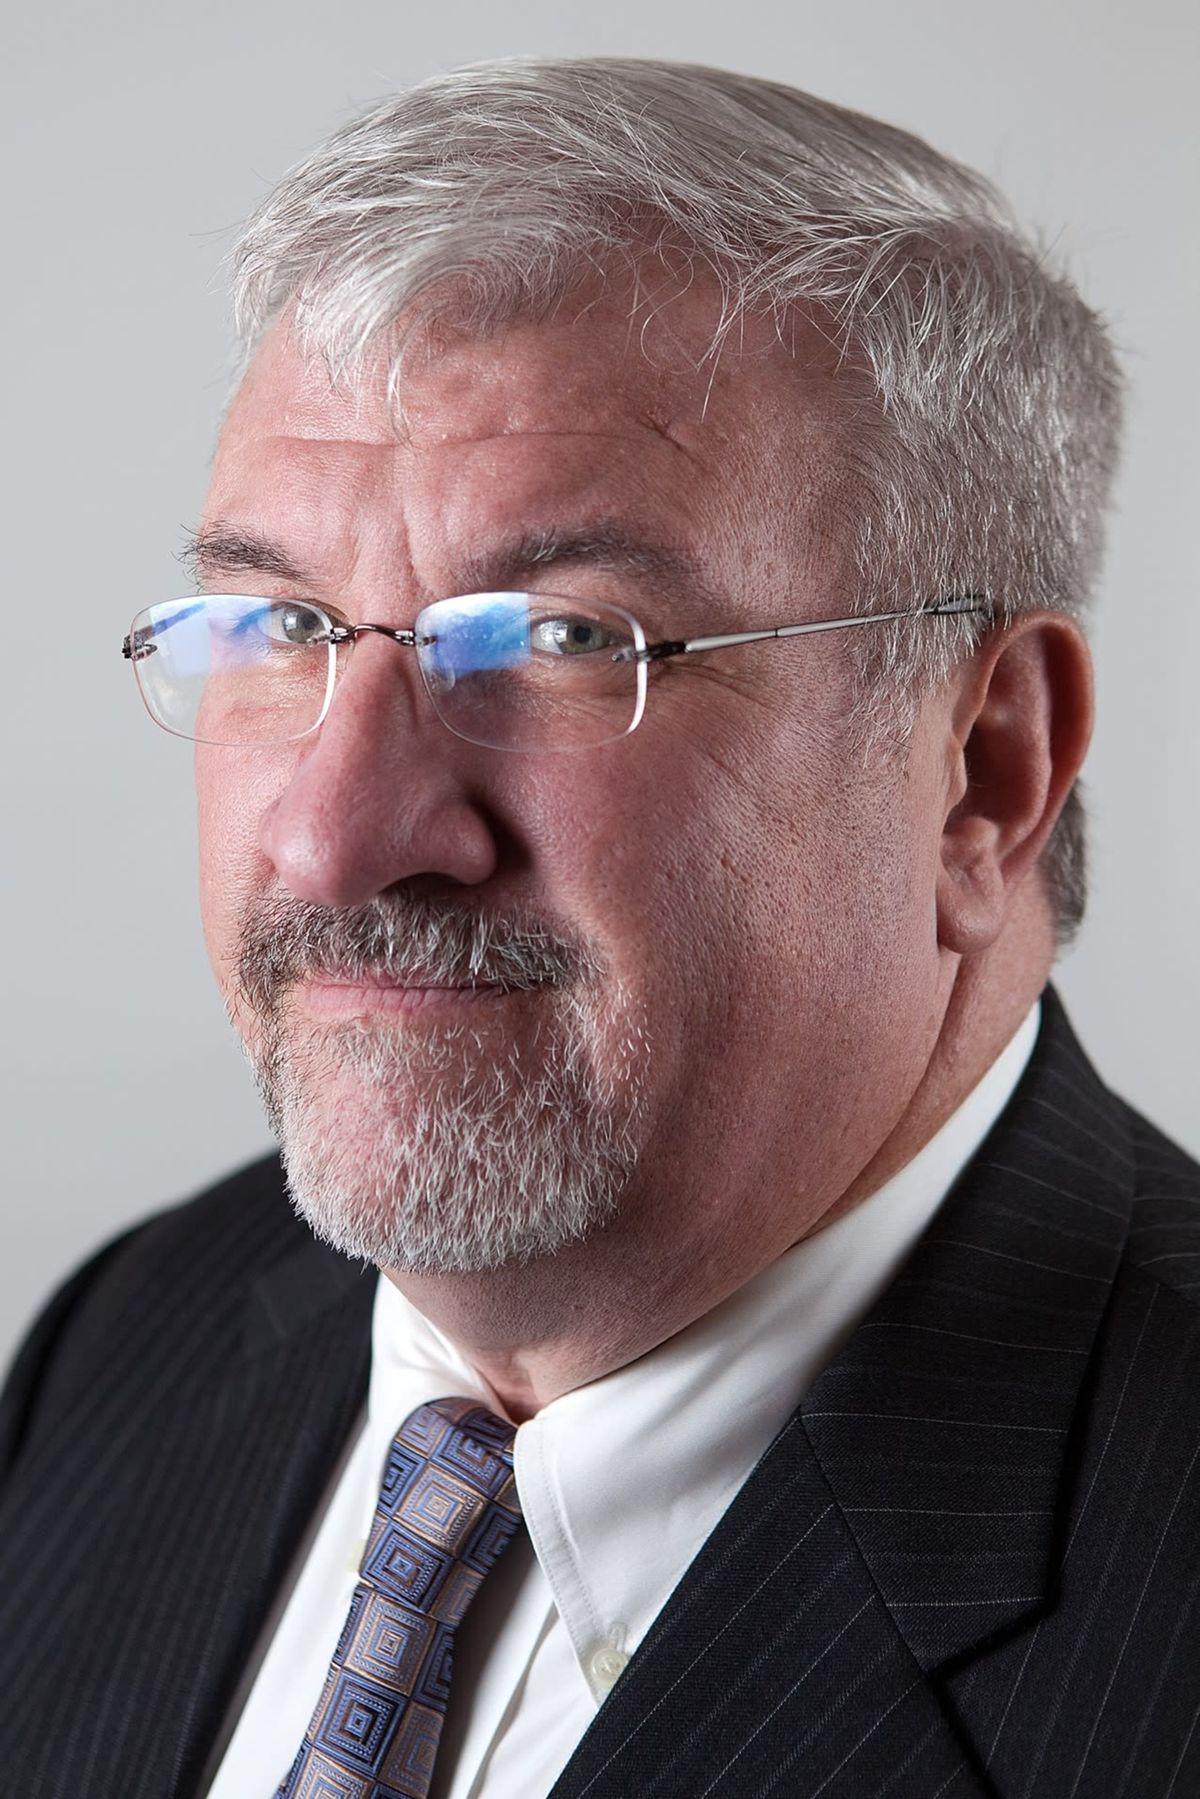 Genprex appoints Dr. William Gannonn VP of Regulatory Affairs, Genprex